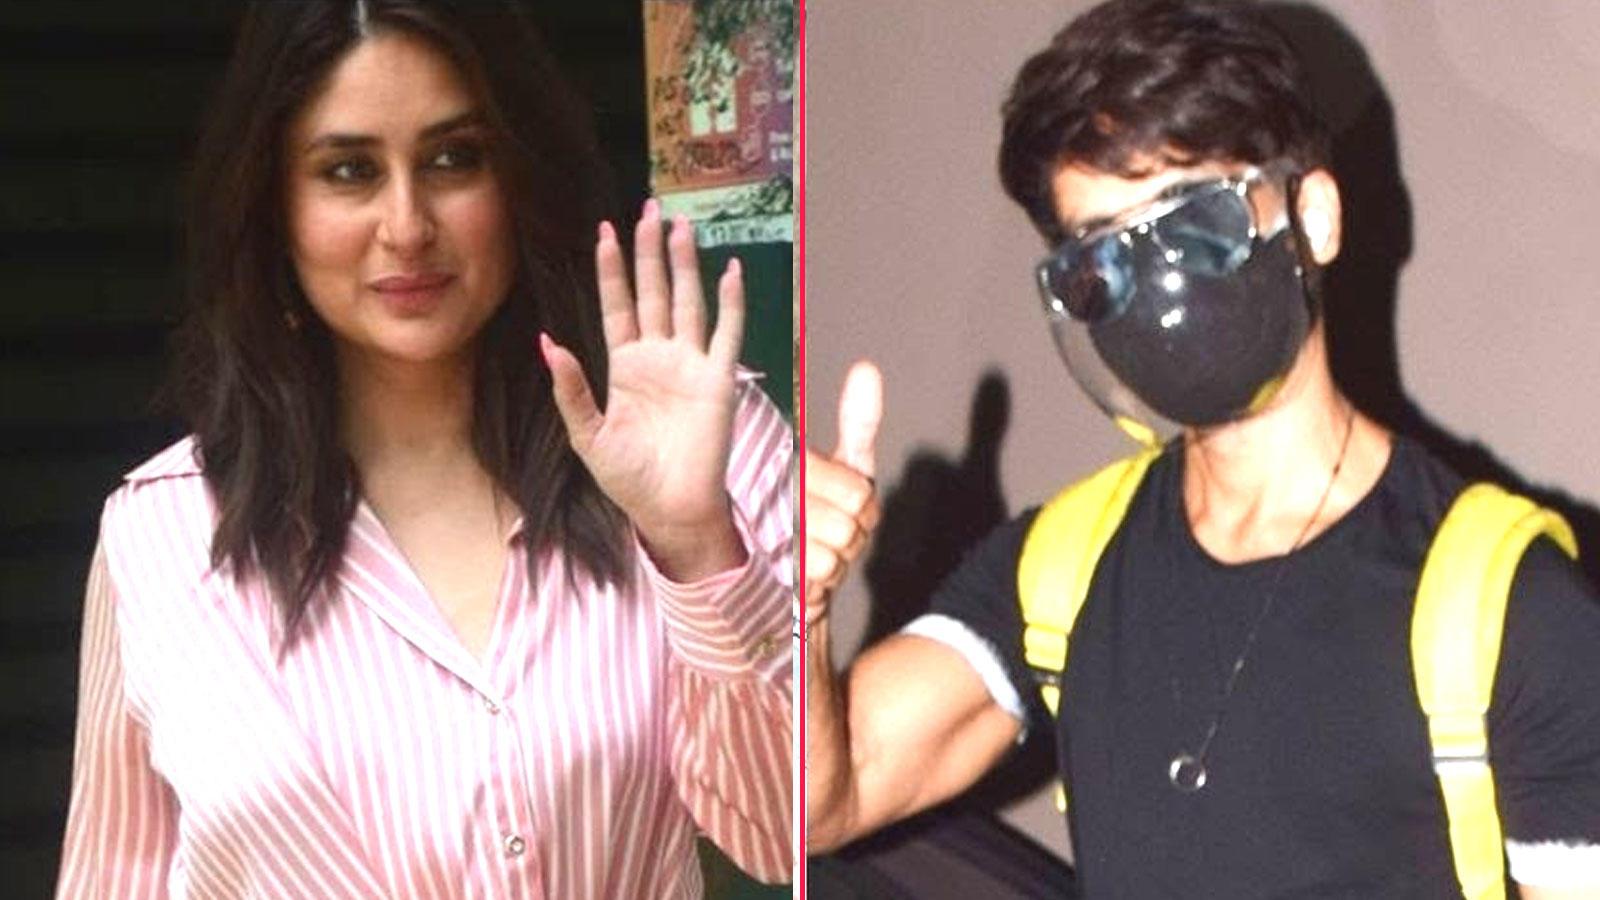 From Kareena Kapoor to Shahid Kapoor, Bollywood celebs spotted in Mumbai | Hindi Movie News – Bollywood – Times of India